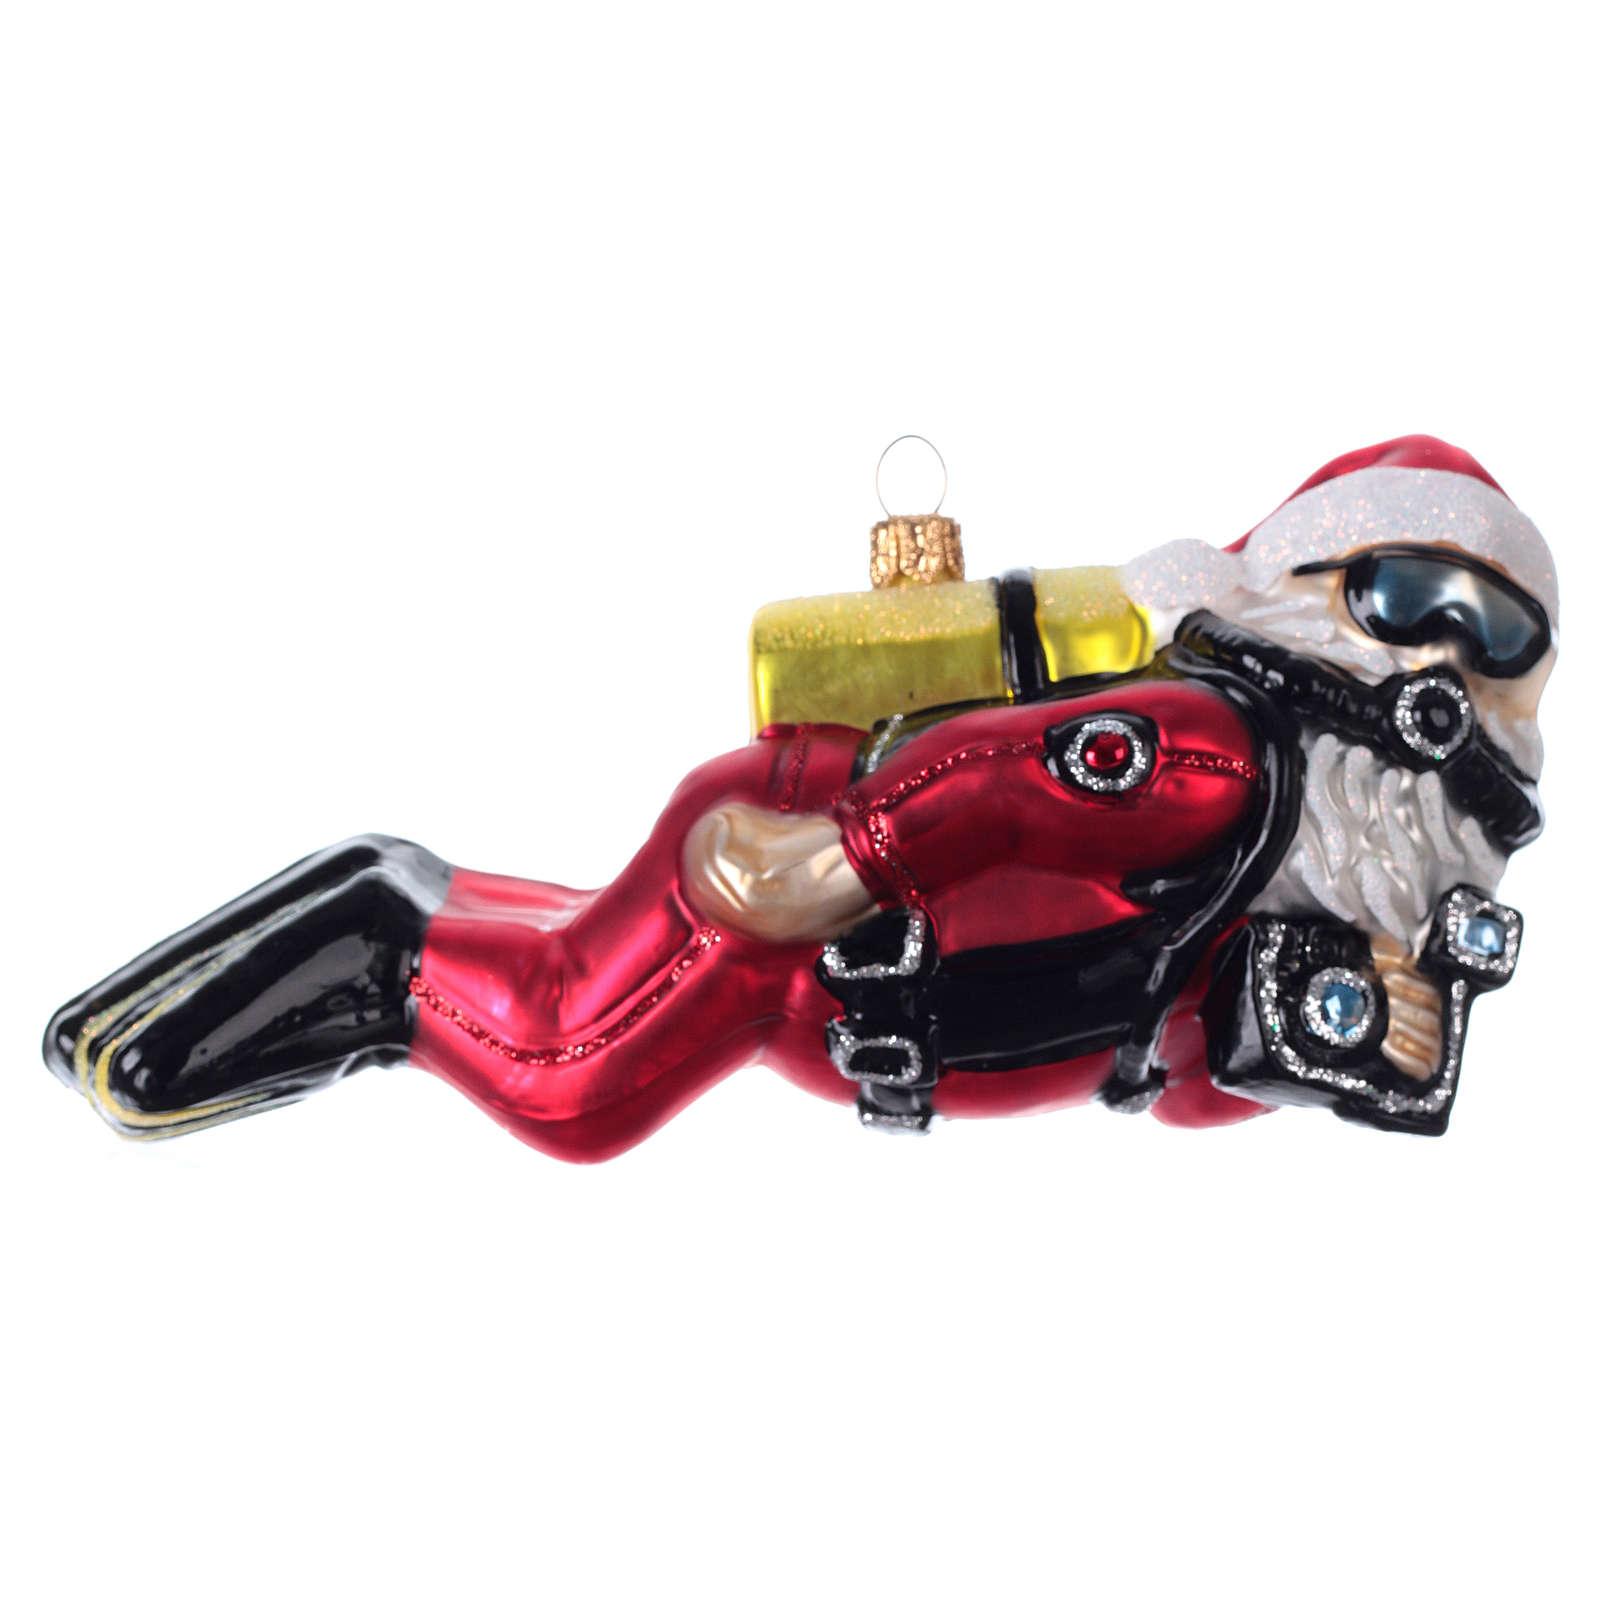 Diving Santa Claus, blown glass Christmas ornament 4